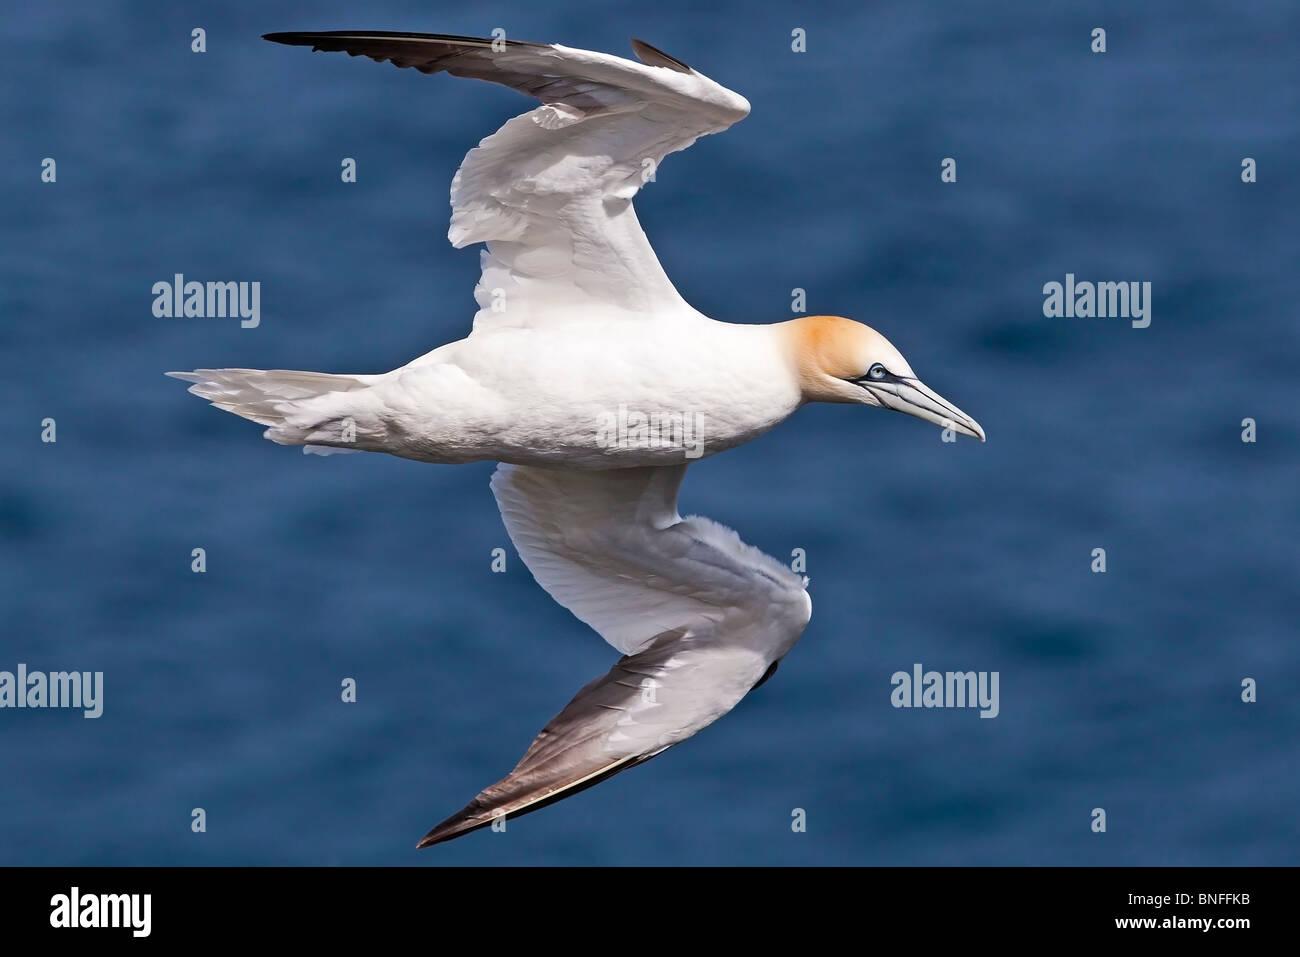 Gannet in flight over a blue sea. - Stock Image